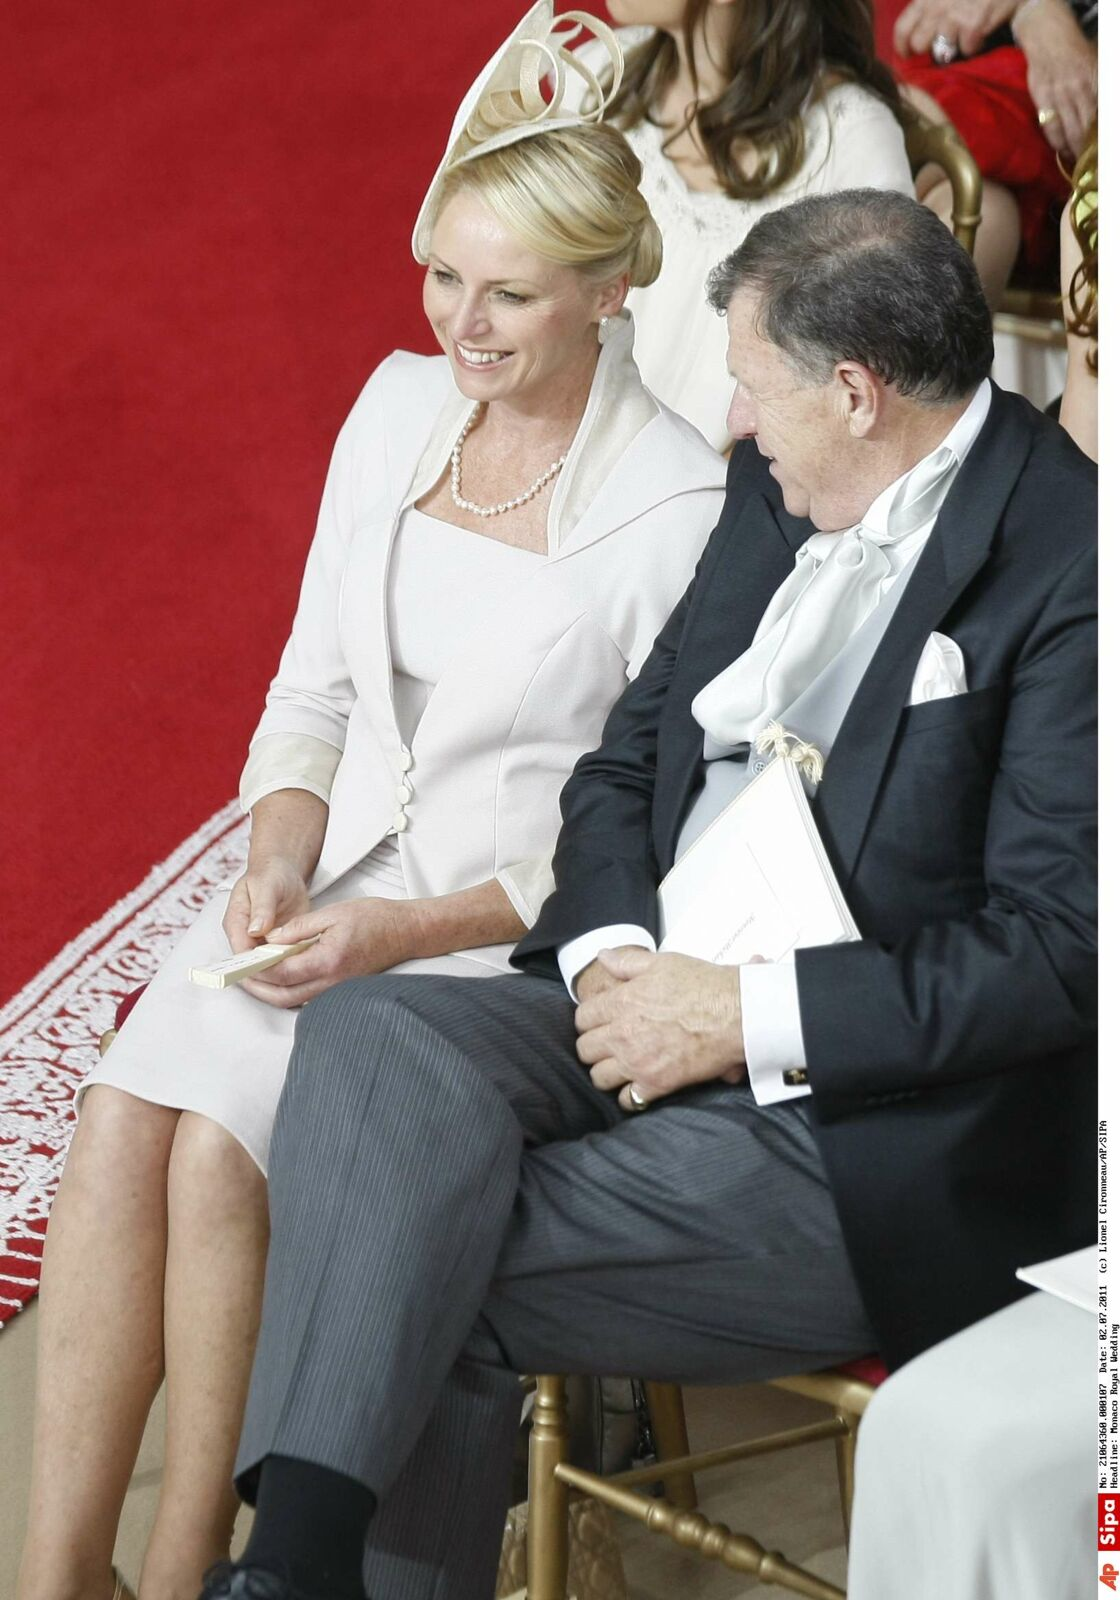 Lynette et Michael Wittstock au mariage de Charlene et Albert de Monaco